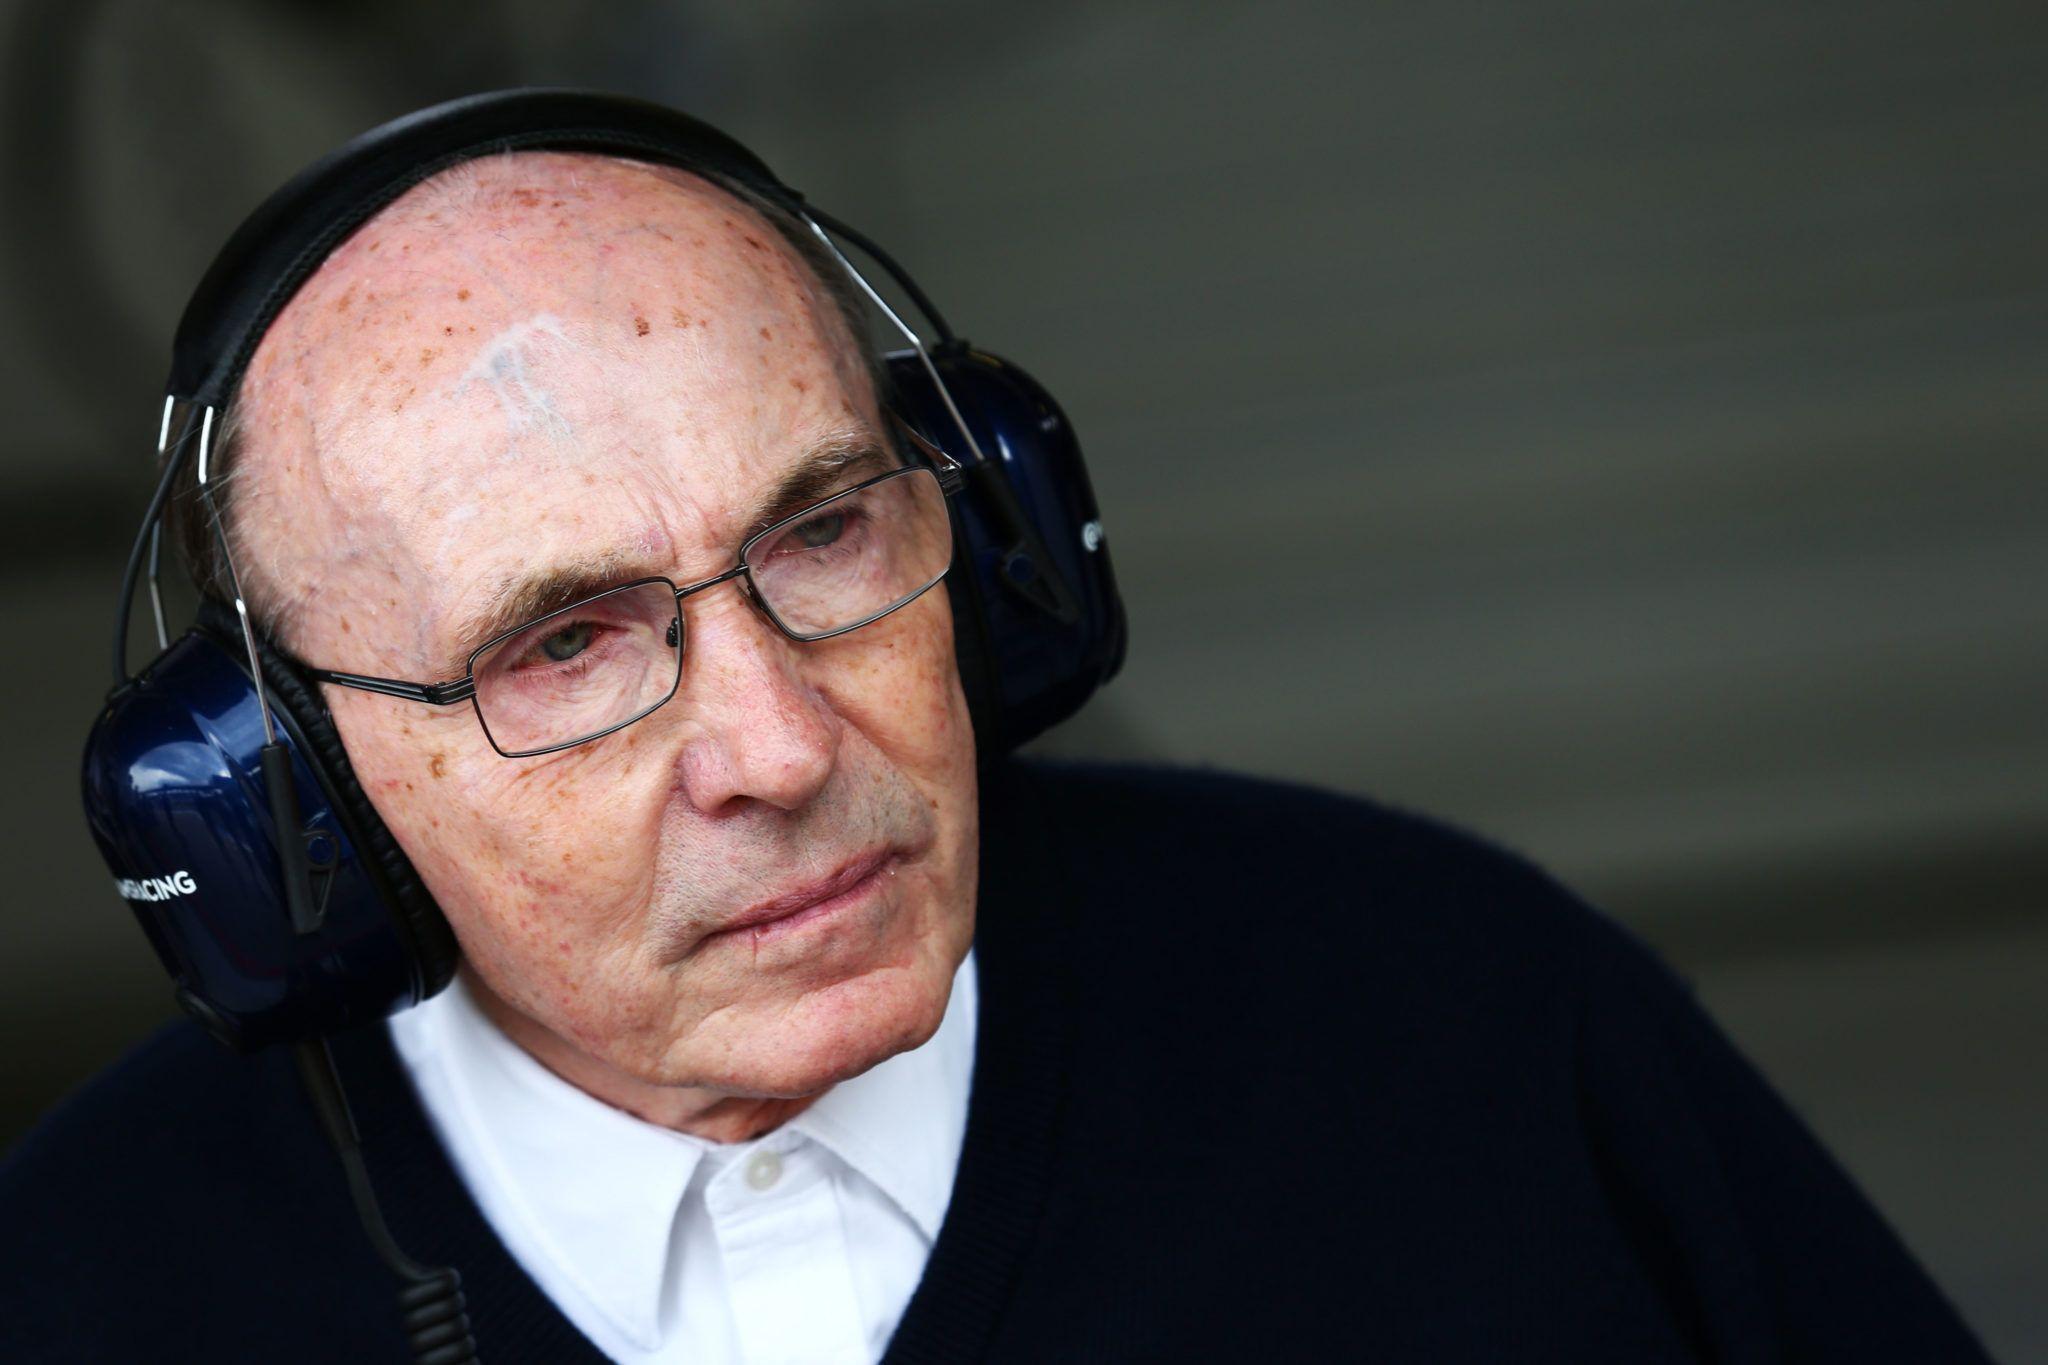 F1, Frank Williams, Callum Ilott